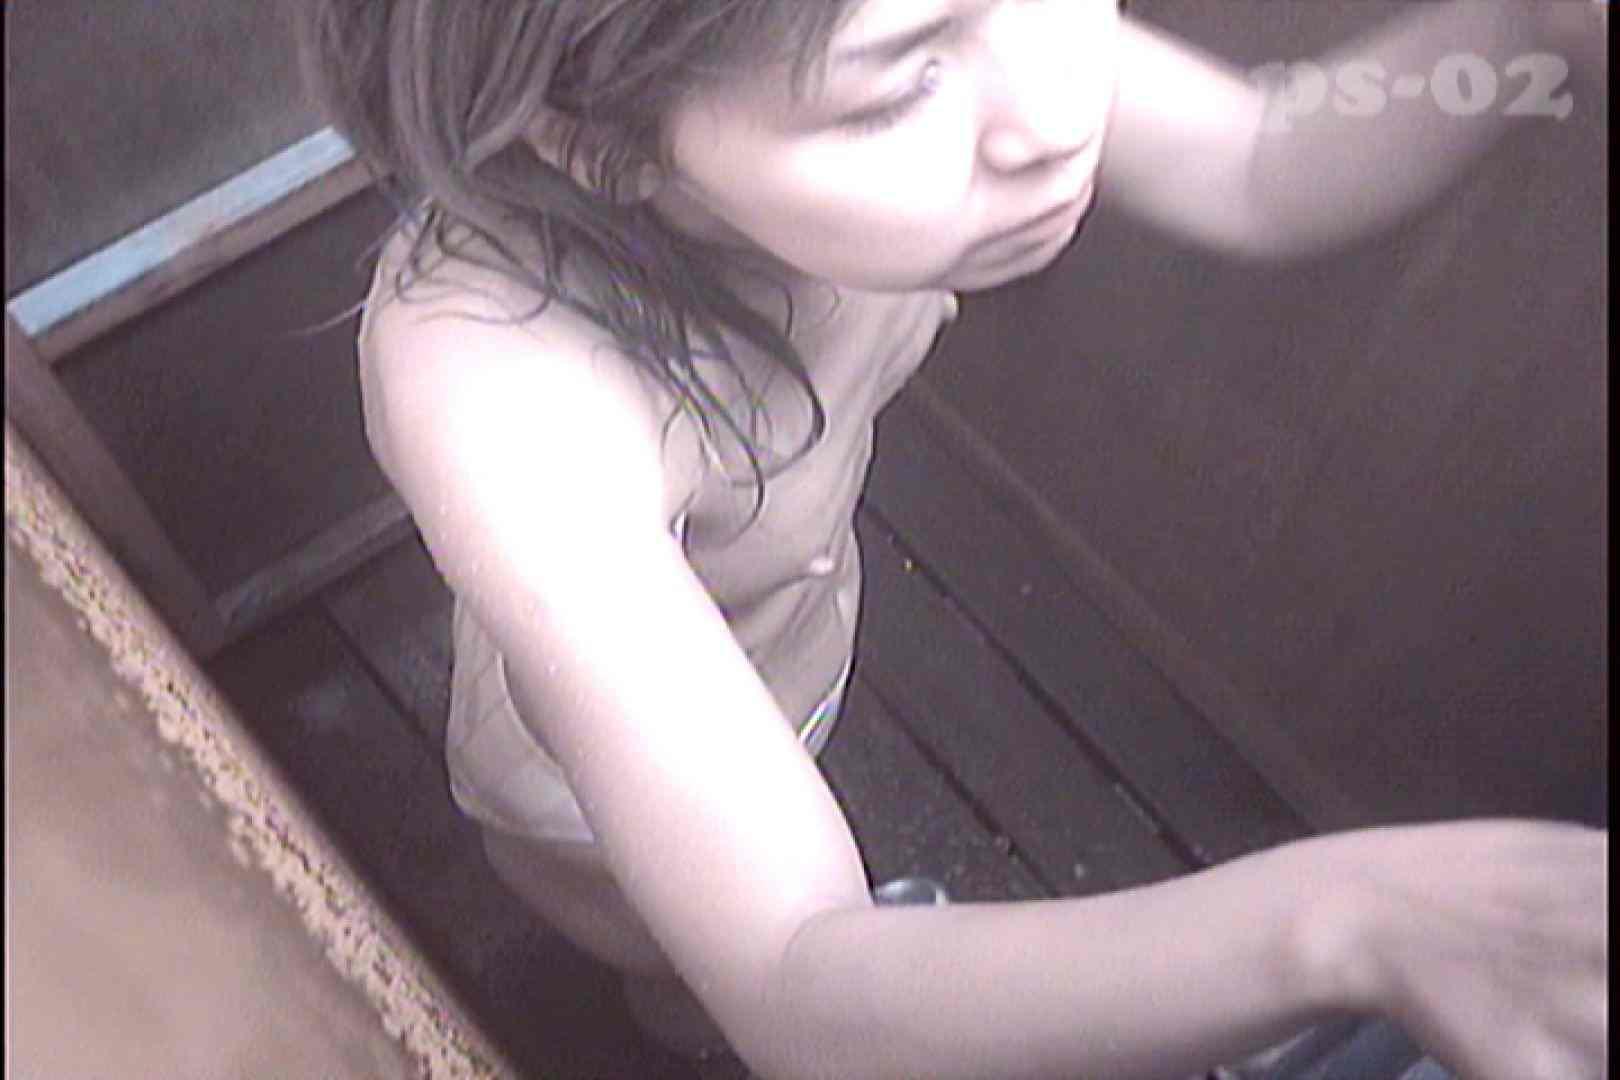 File.09 貧乳そして大きな乳首のお女市さん 盗撮編 エロ無料画像 94枚 52